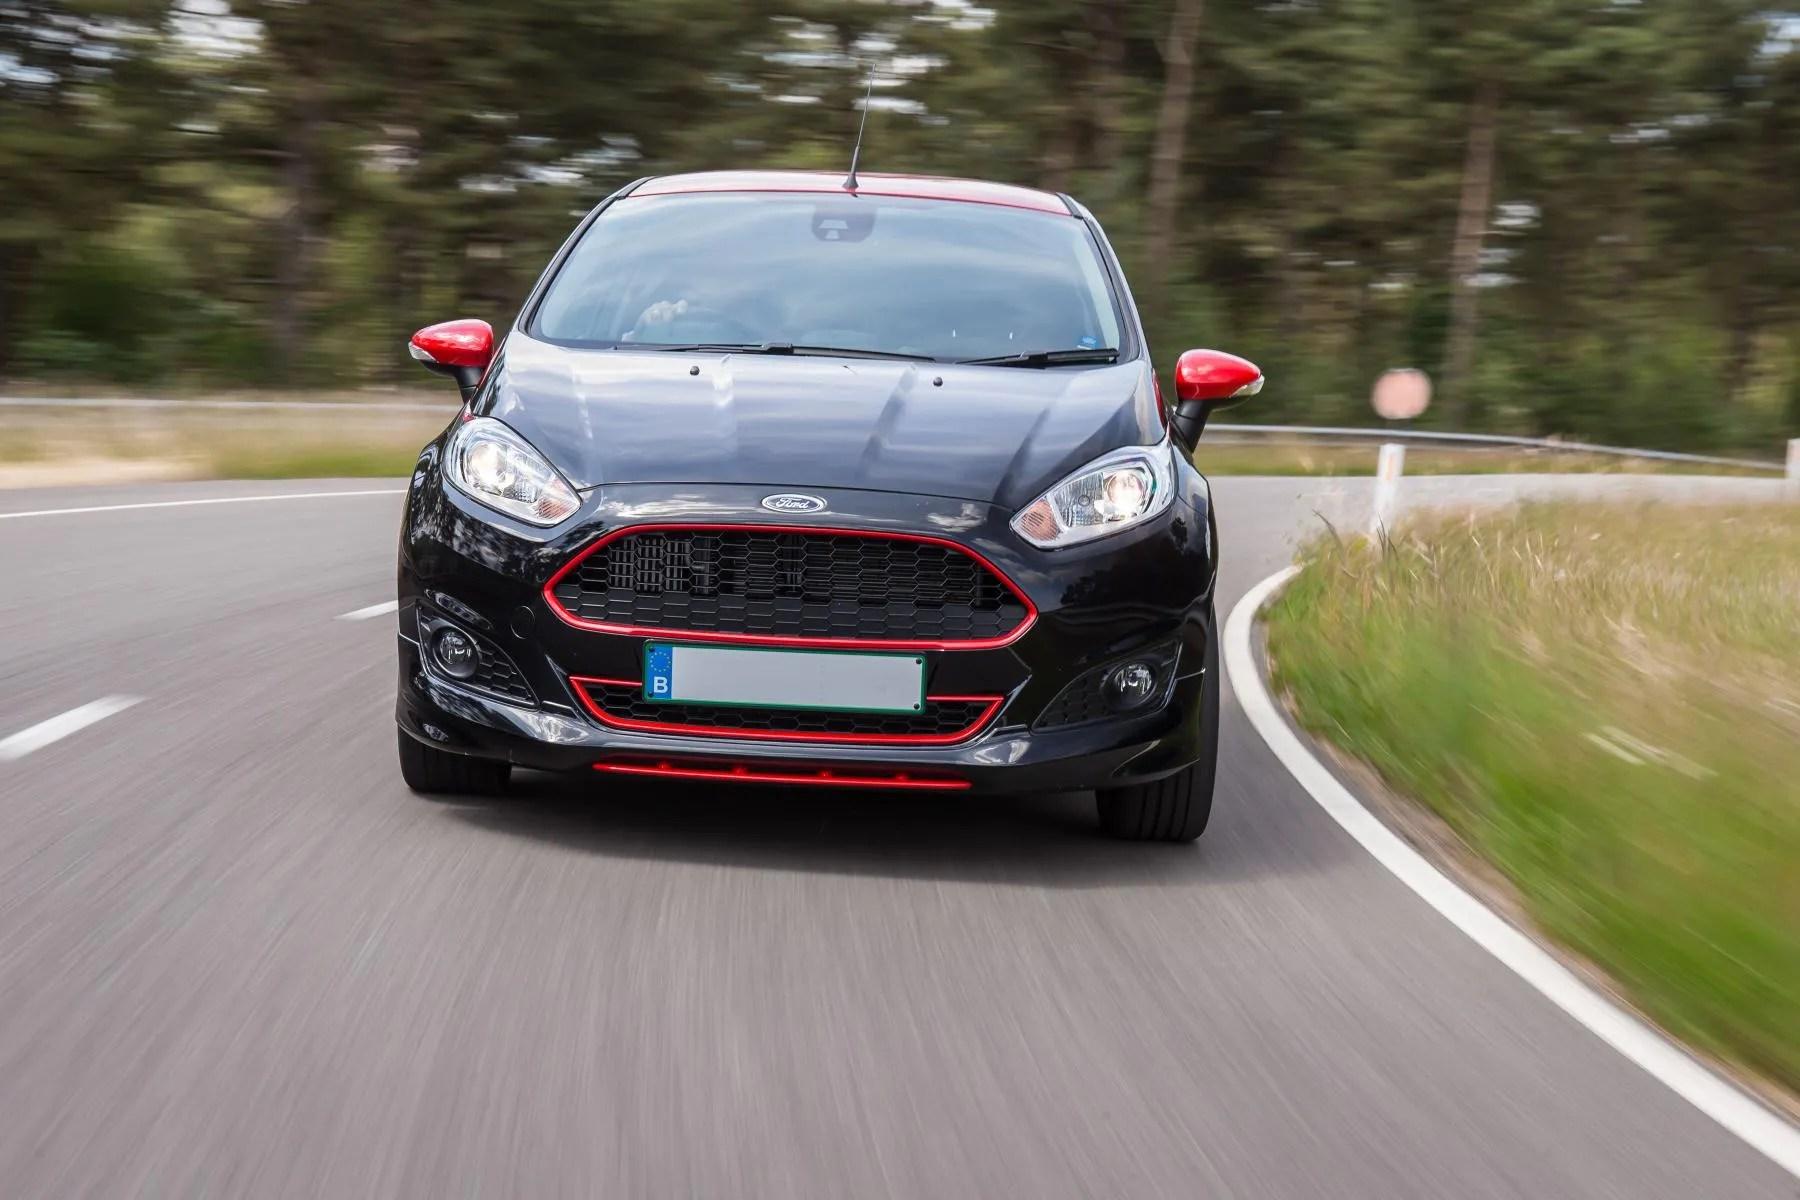 Ford Fiesta Aston Martin